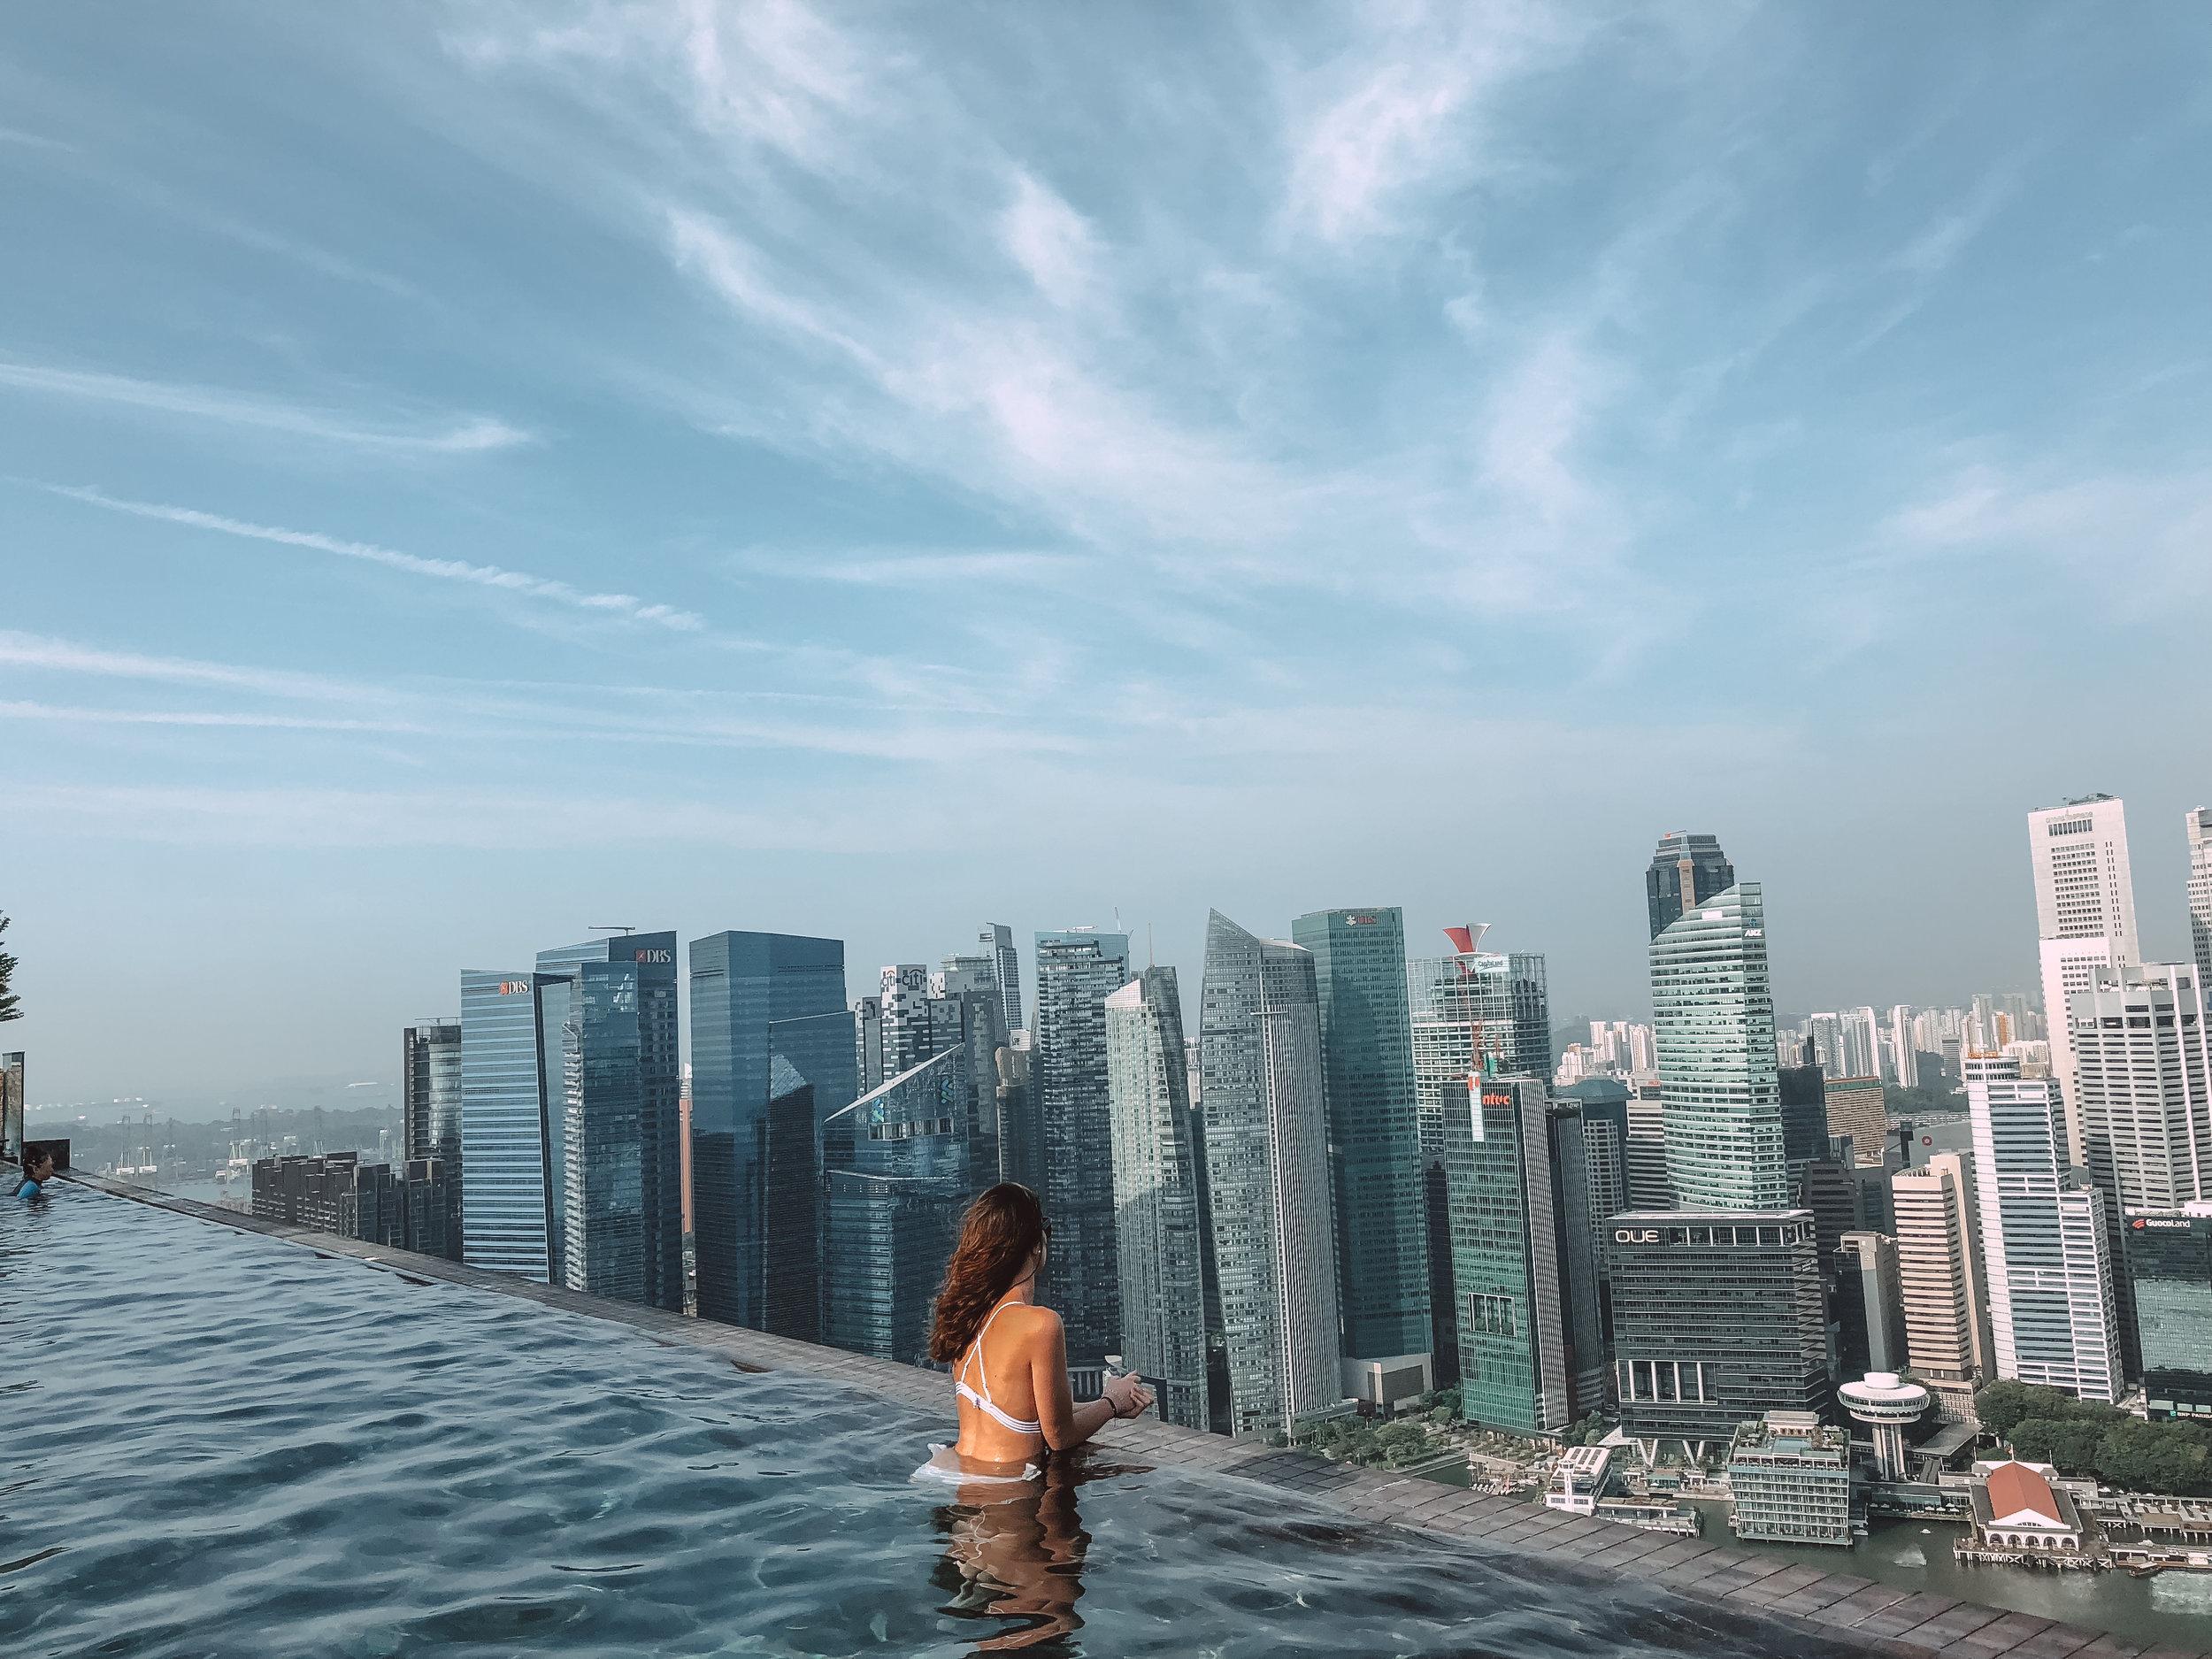 mathilde-schwindowsky-singapour-the-cheerfulist